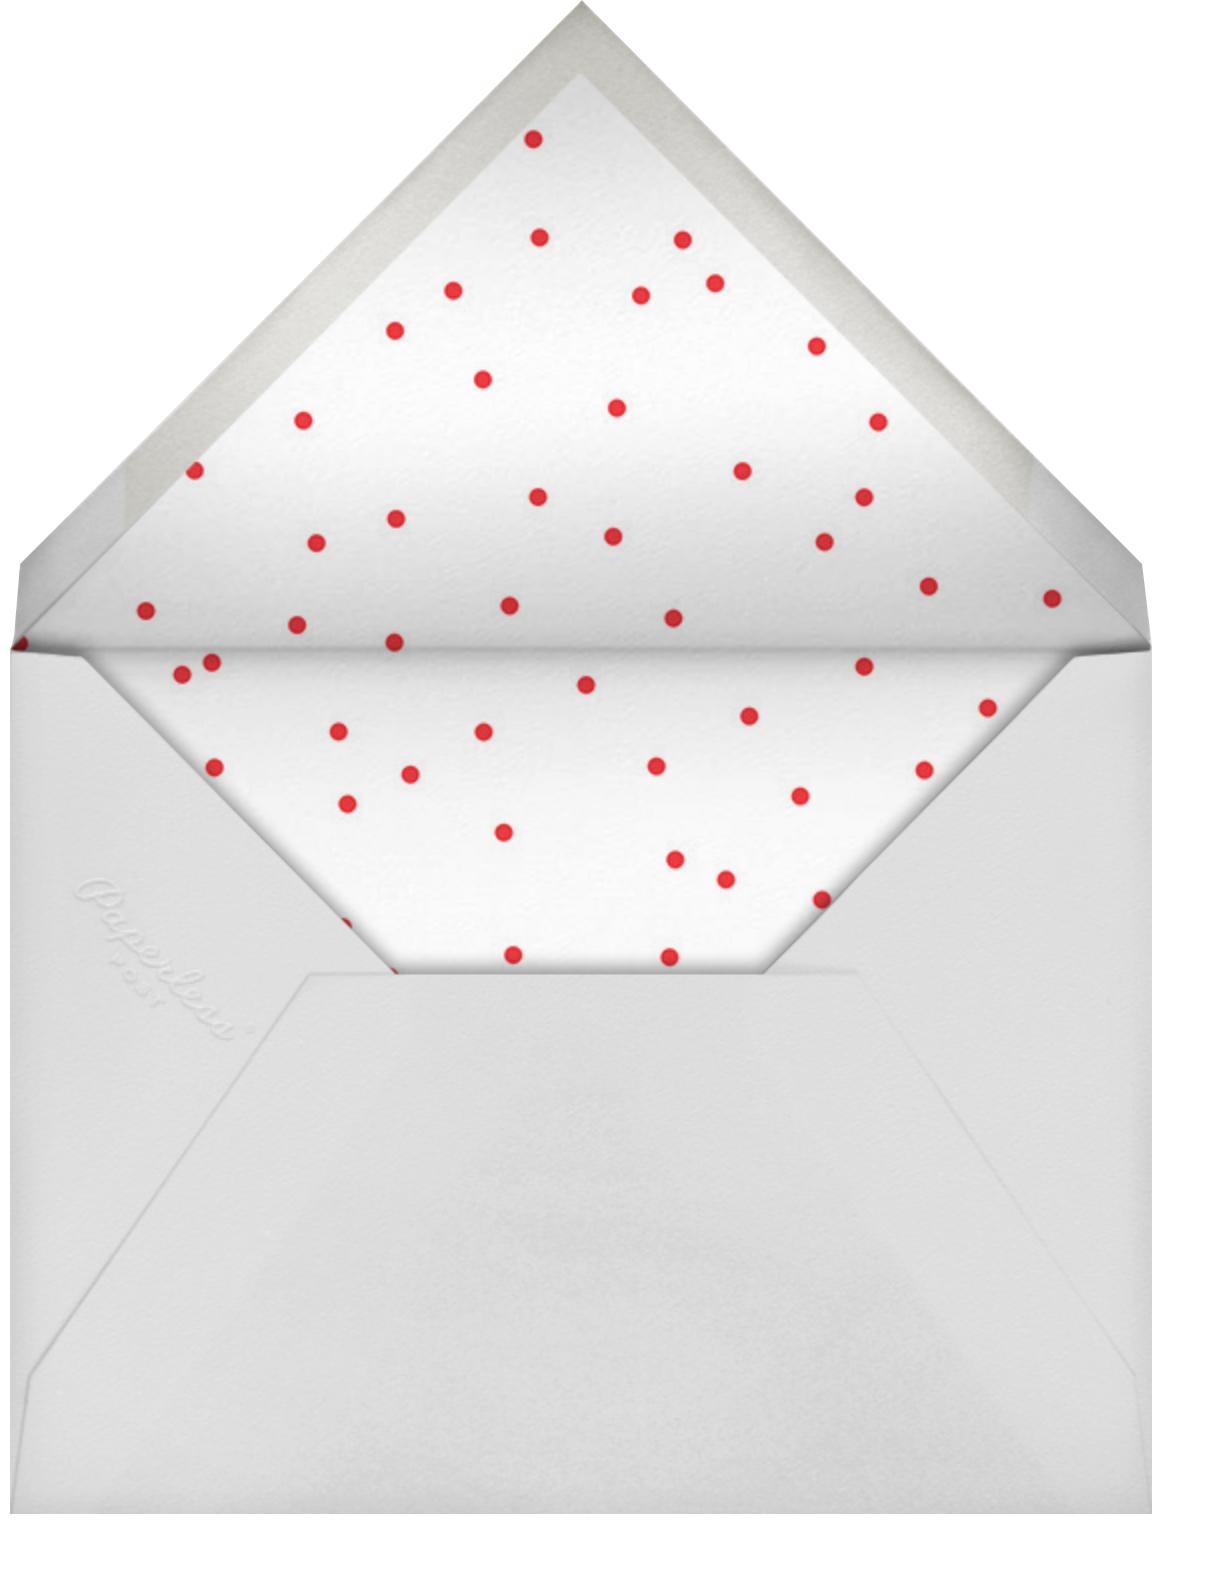 Best Nine - Cheree Berry - Holiday cards - envelope back